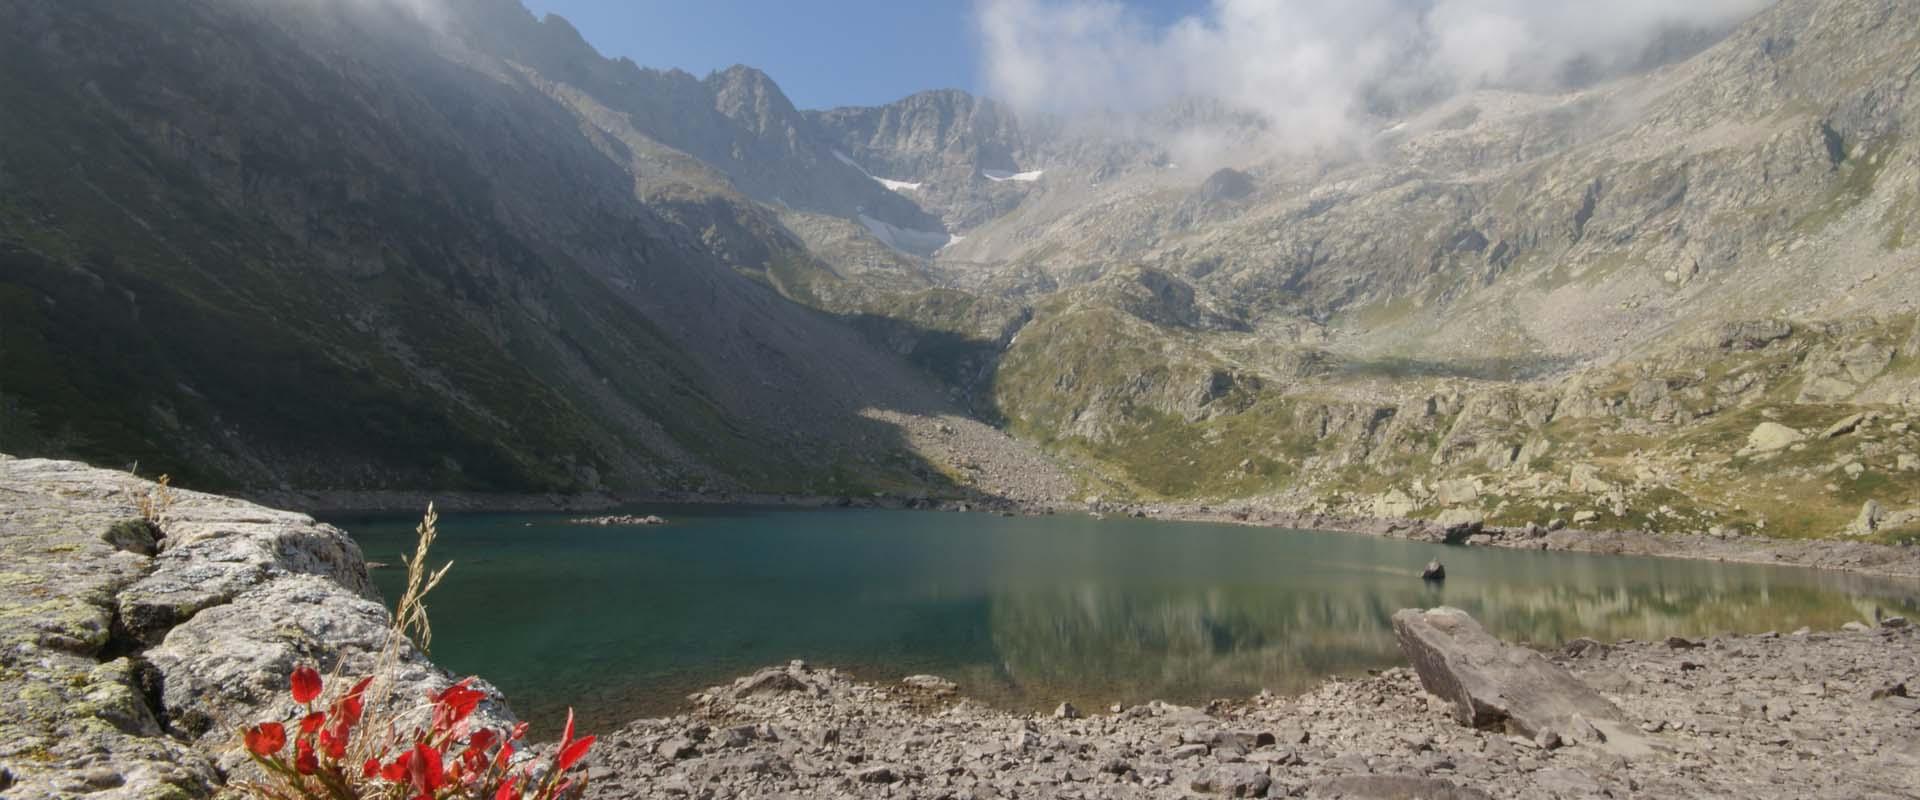 Laghi delle Alpi Marittime